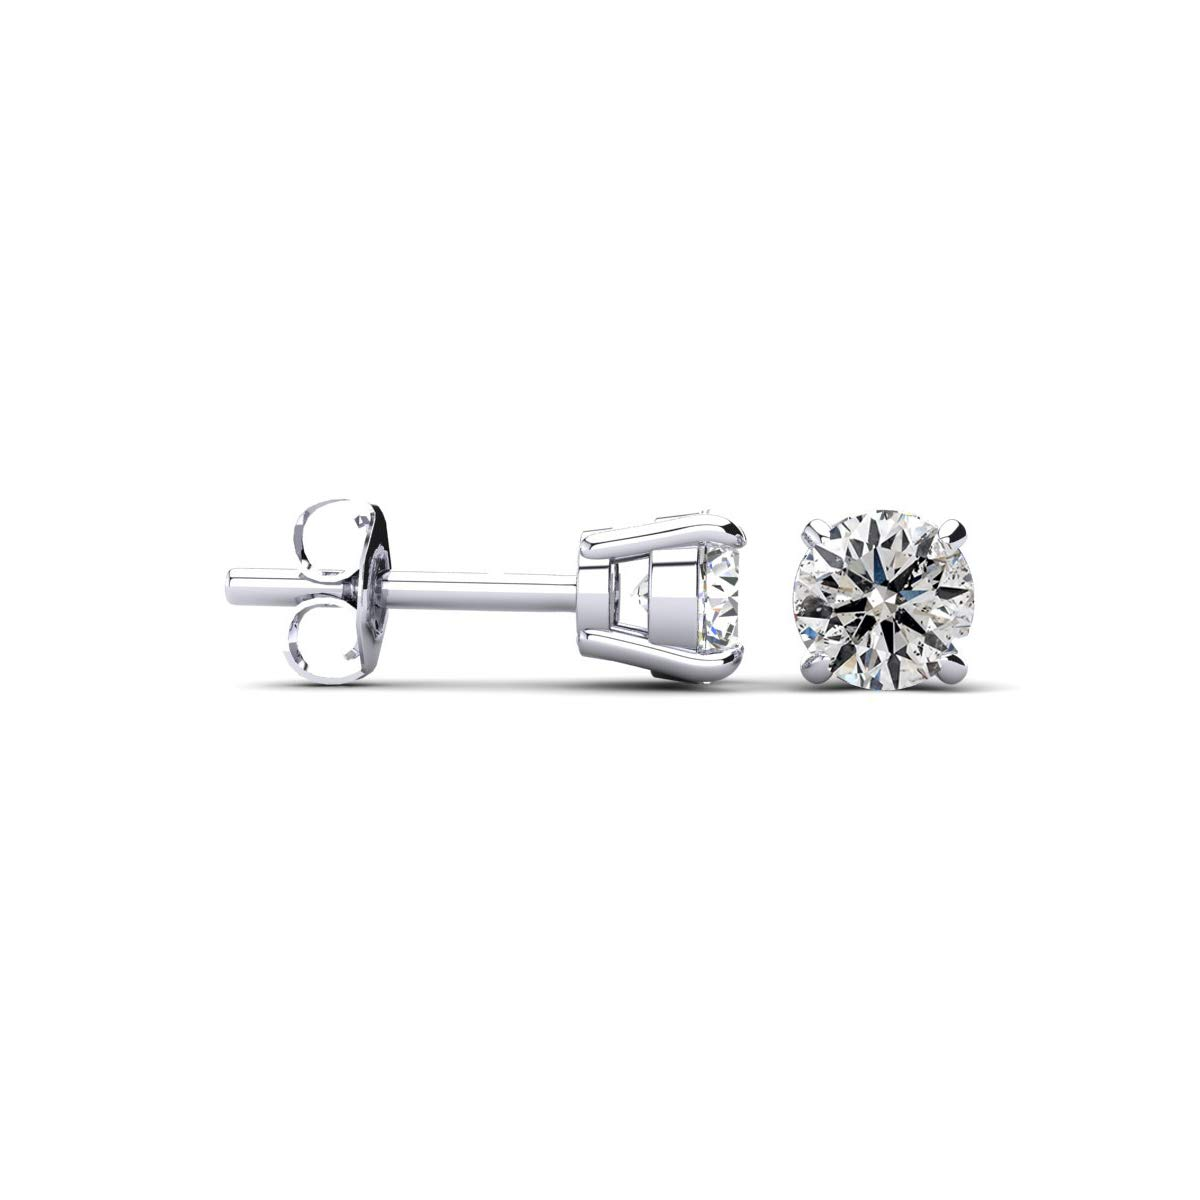 1 1/2 Cttw 14k White Gold Round Diamond Stud Earrings (AGS Certified H-I, I1-I2)